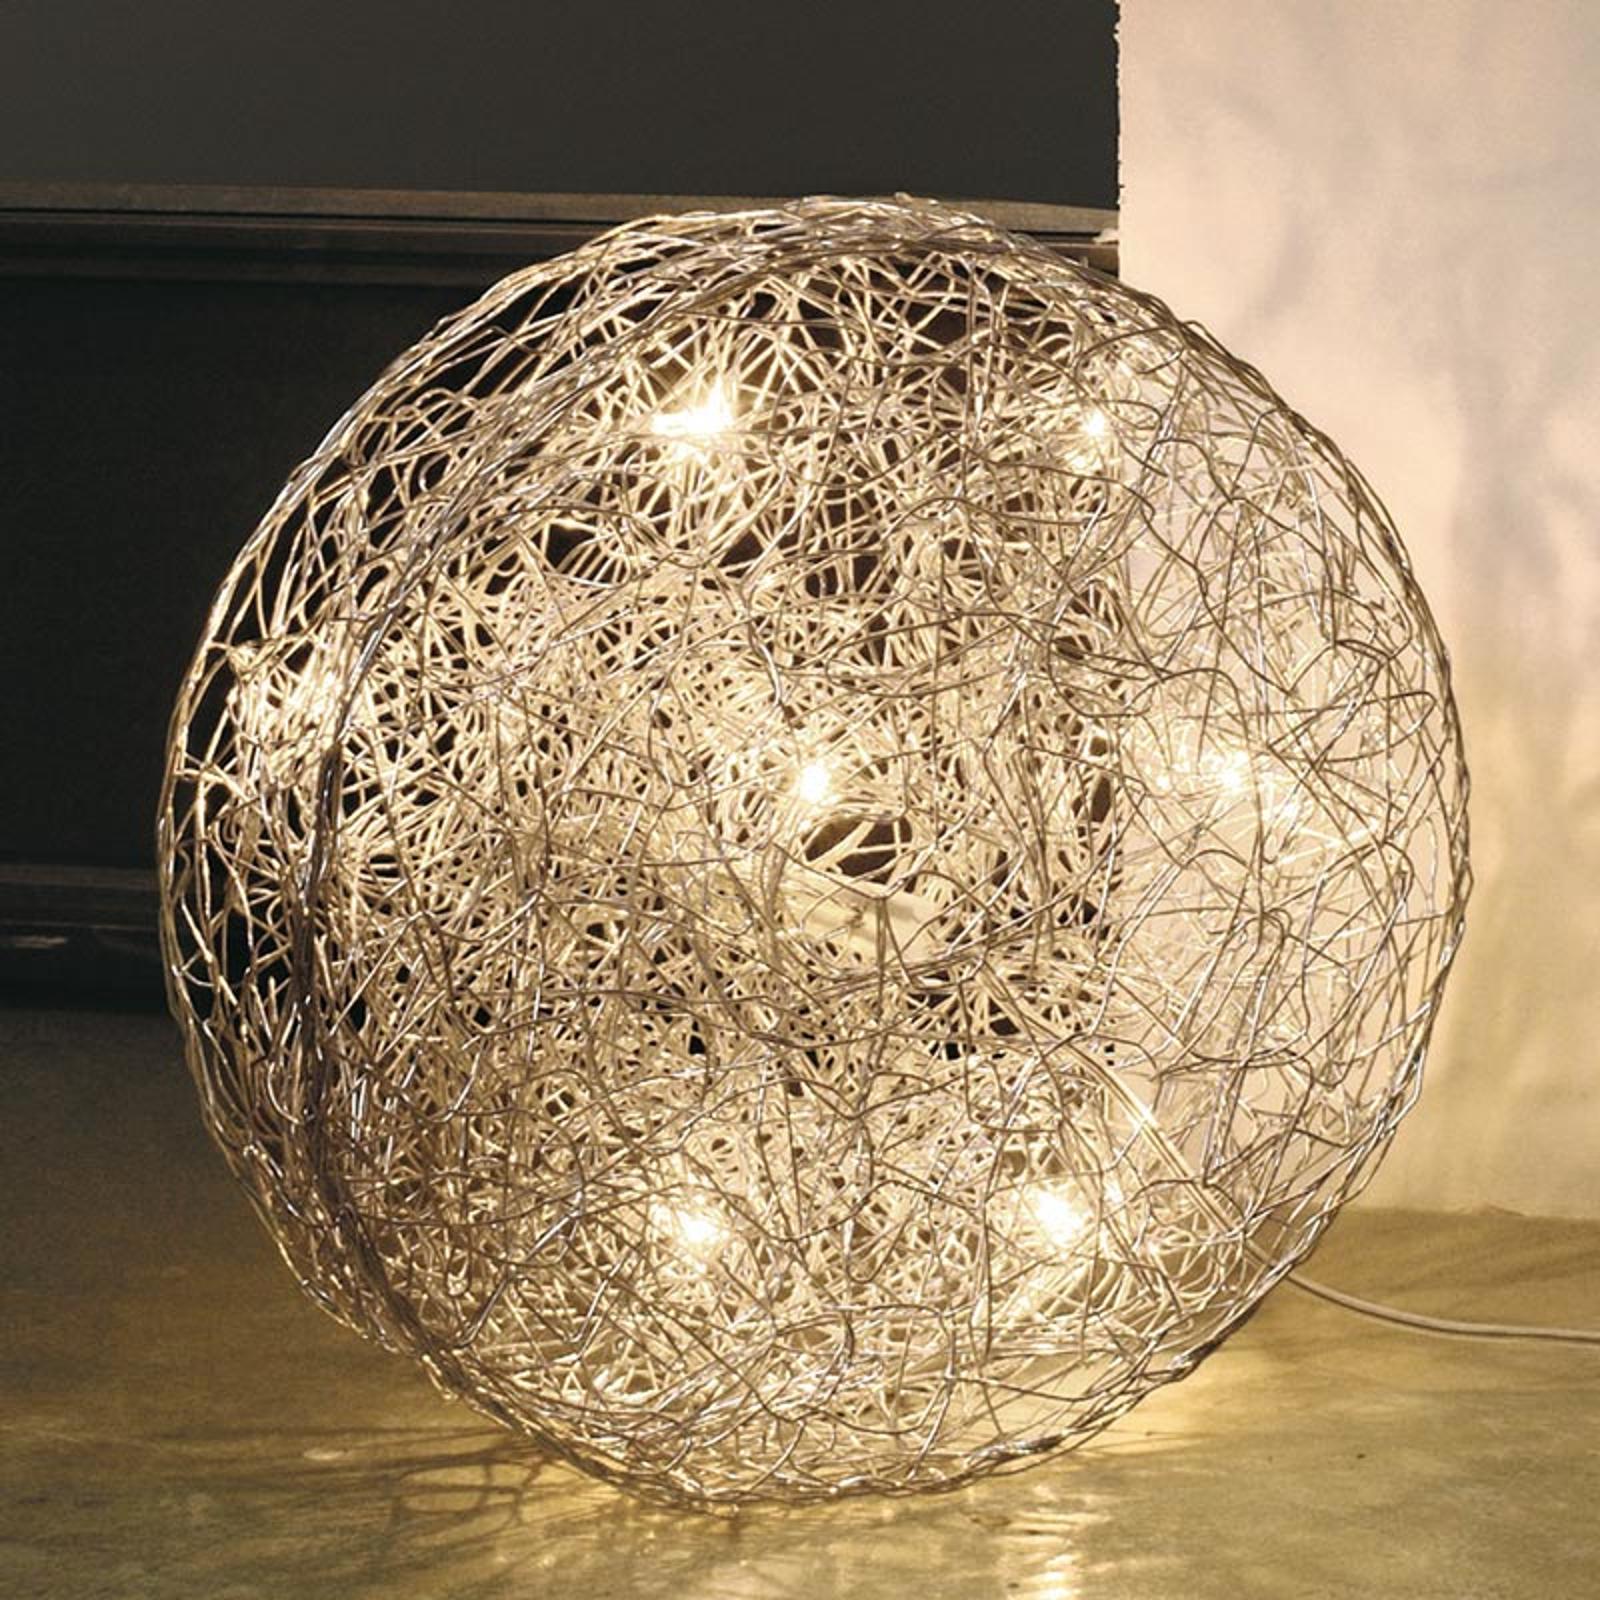 Design vloerlamp Rotola, 40 cm diameter